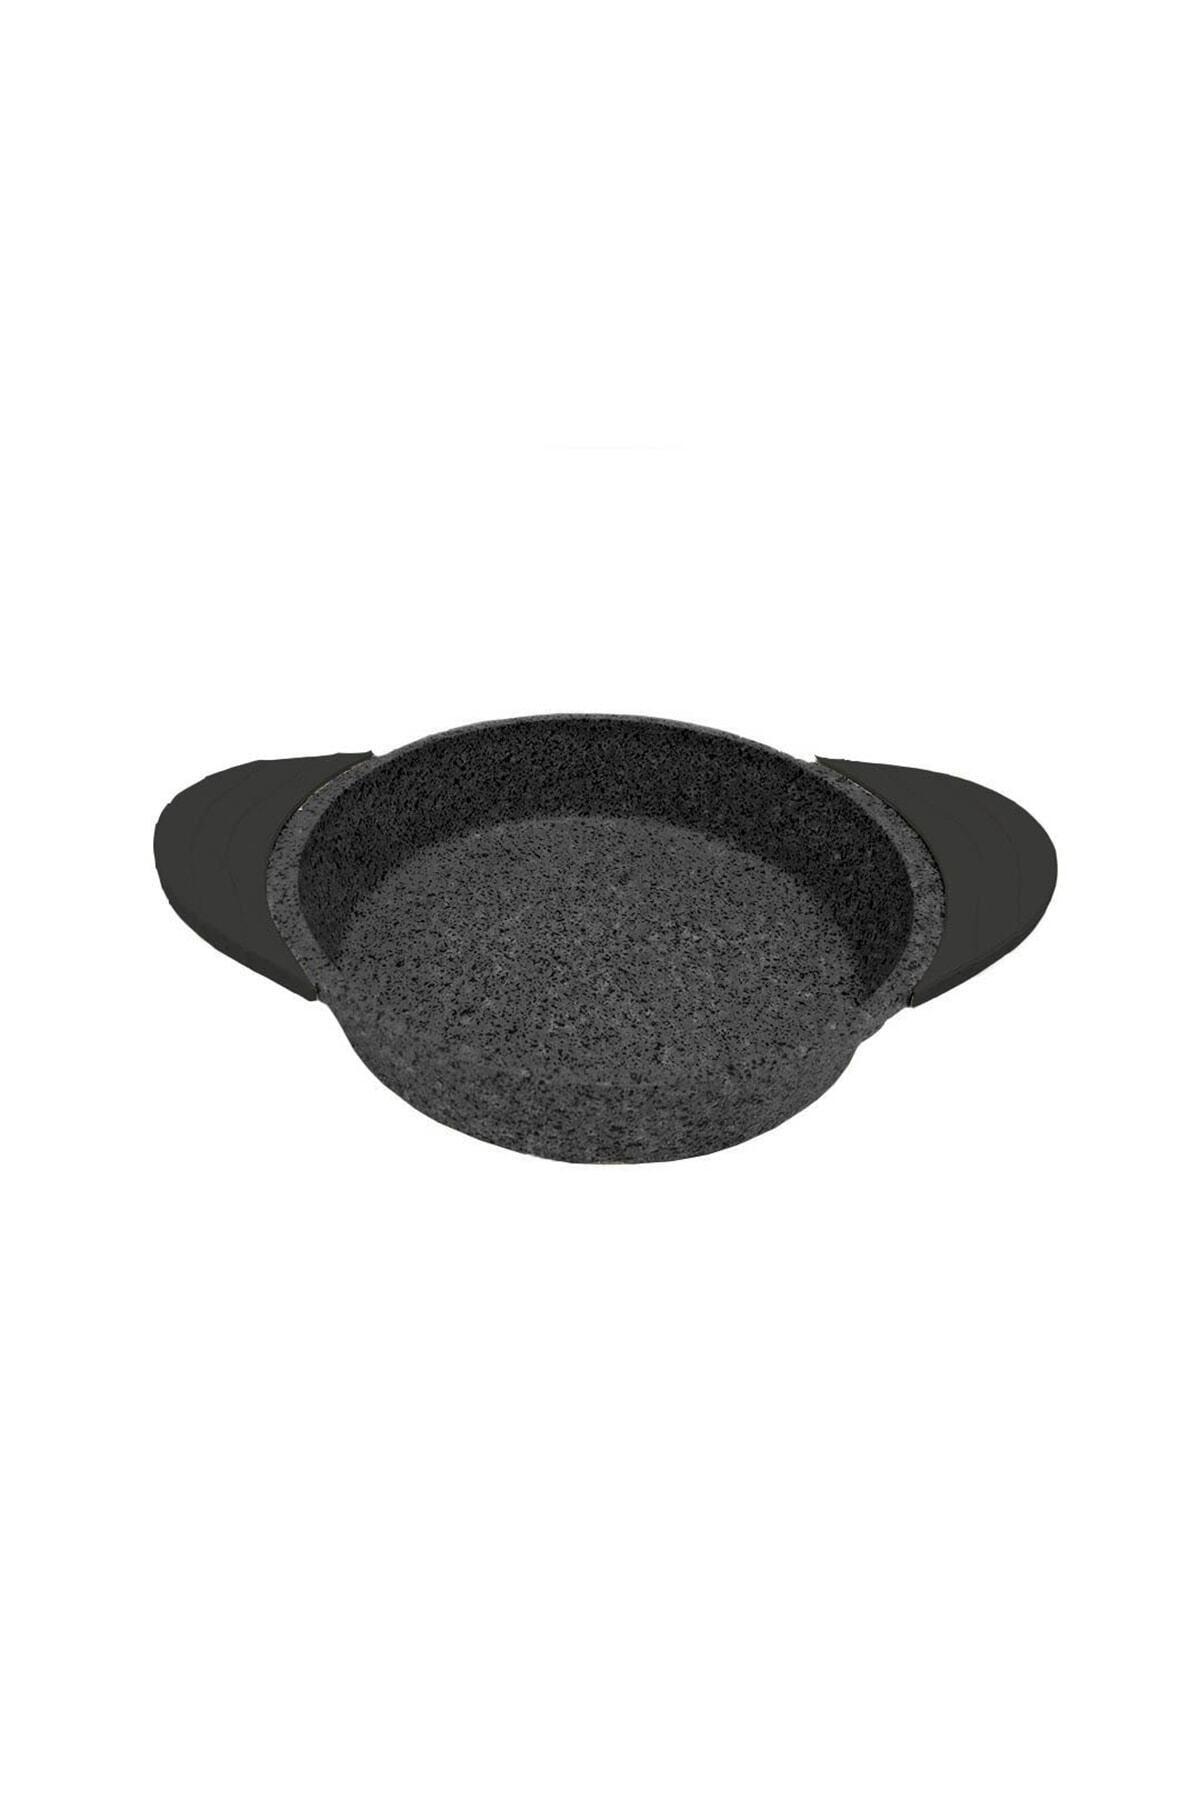 Doacast-3011 Döküm Granit 22 Sahan Siyah